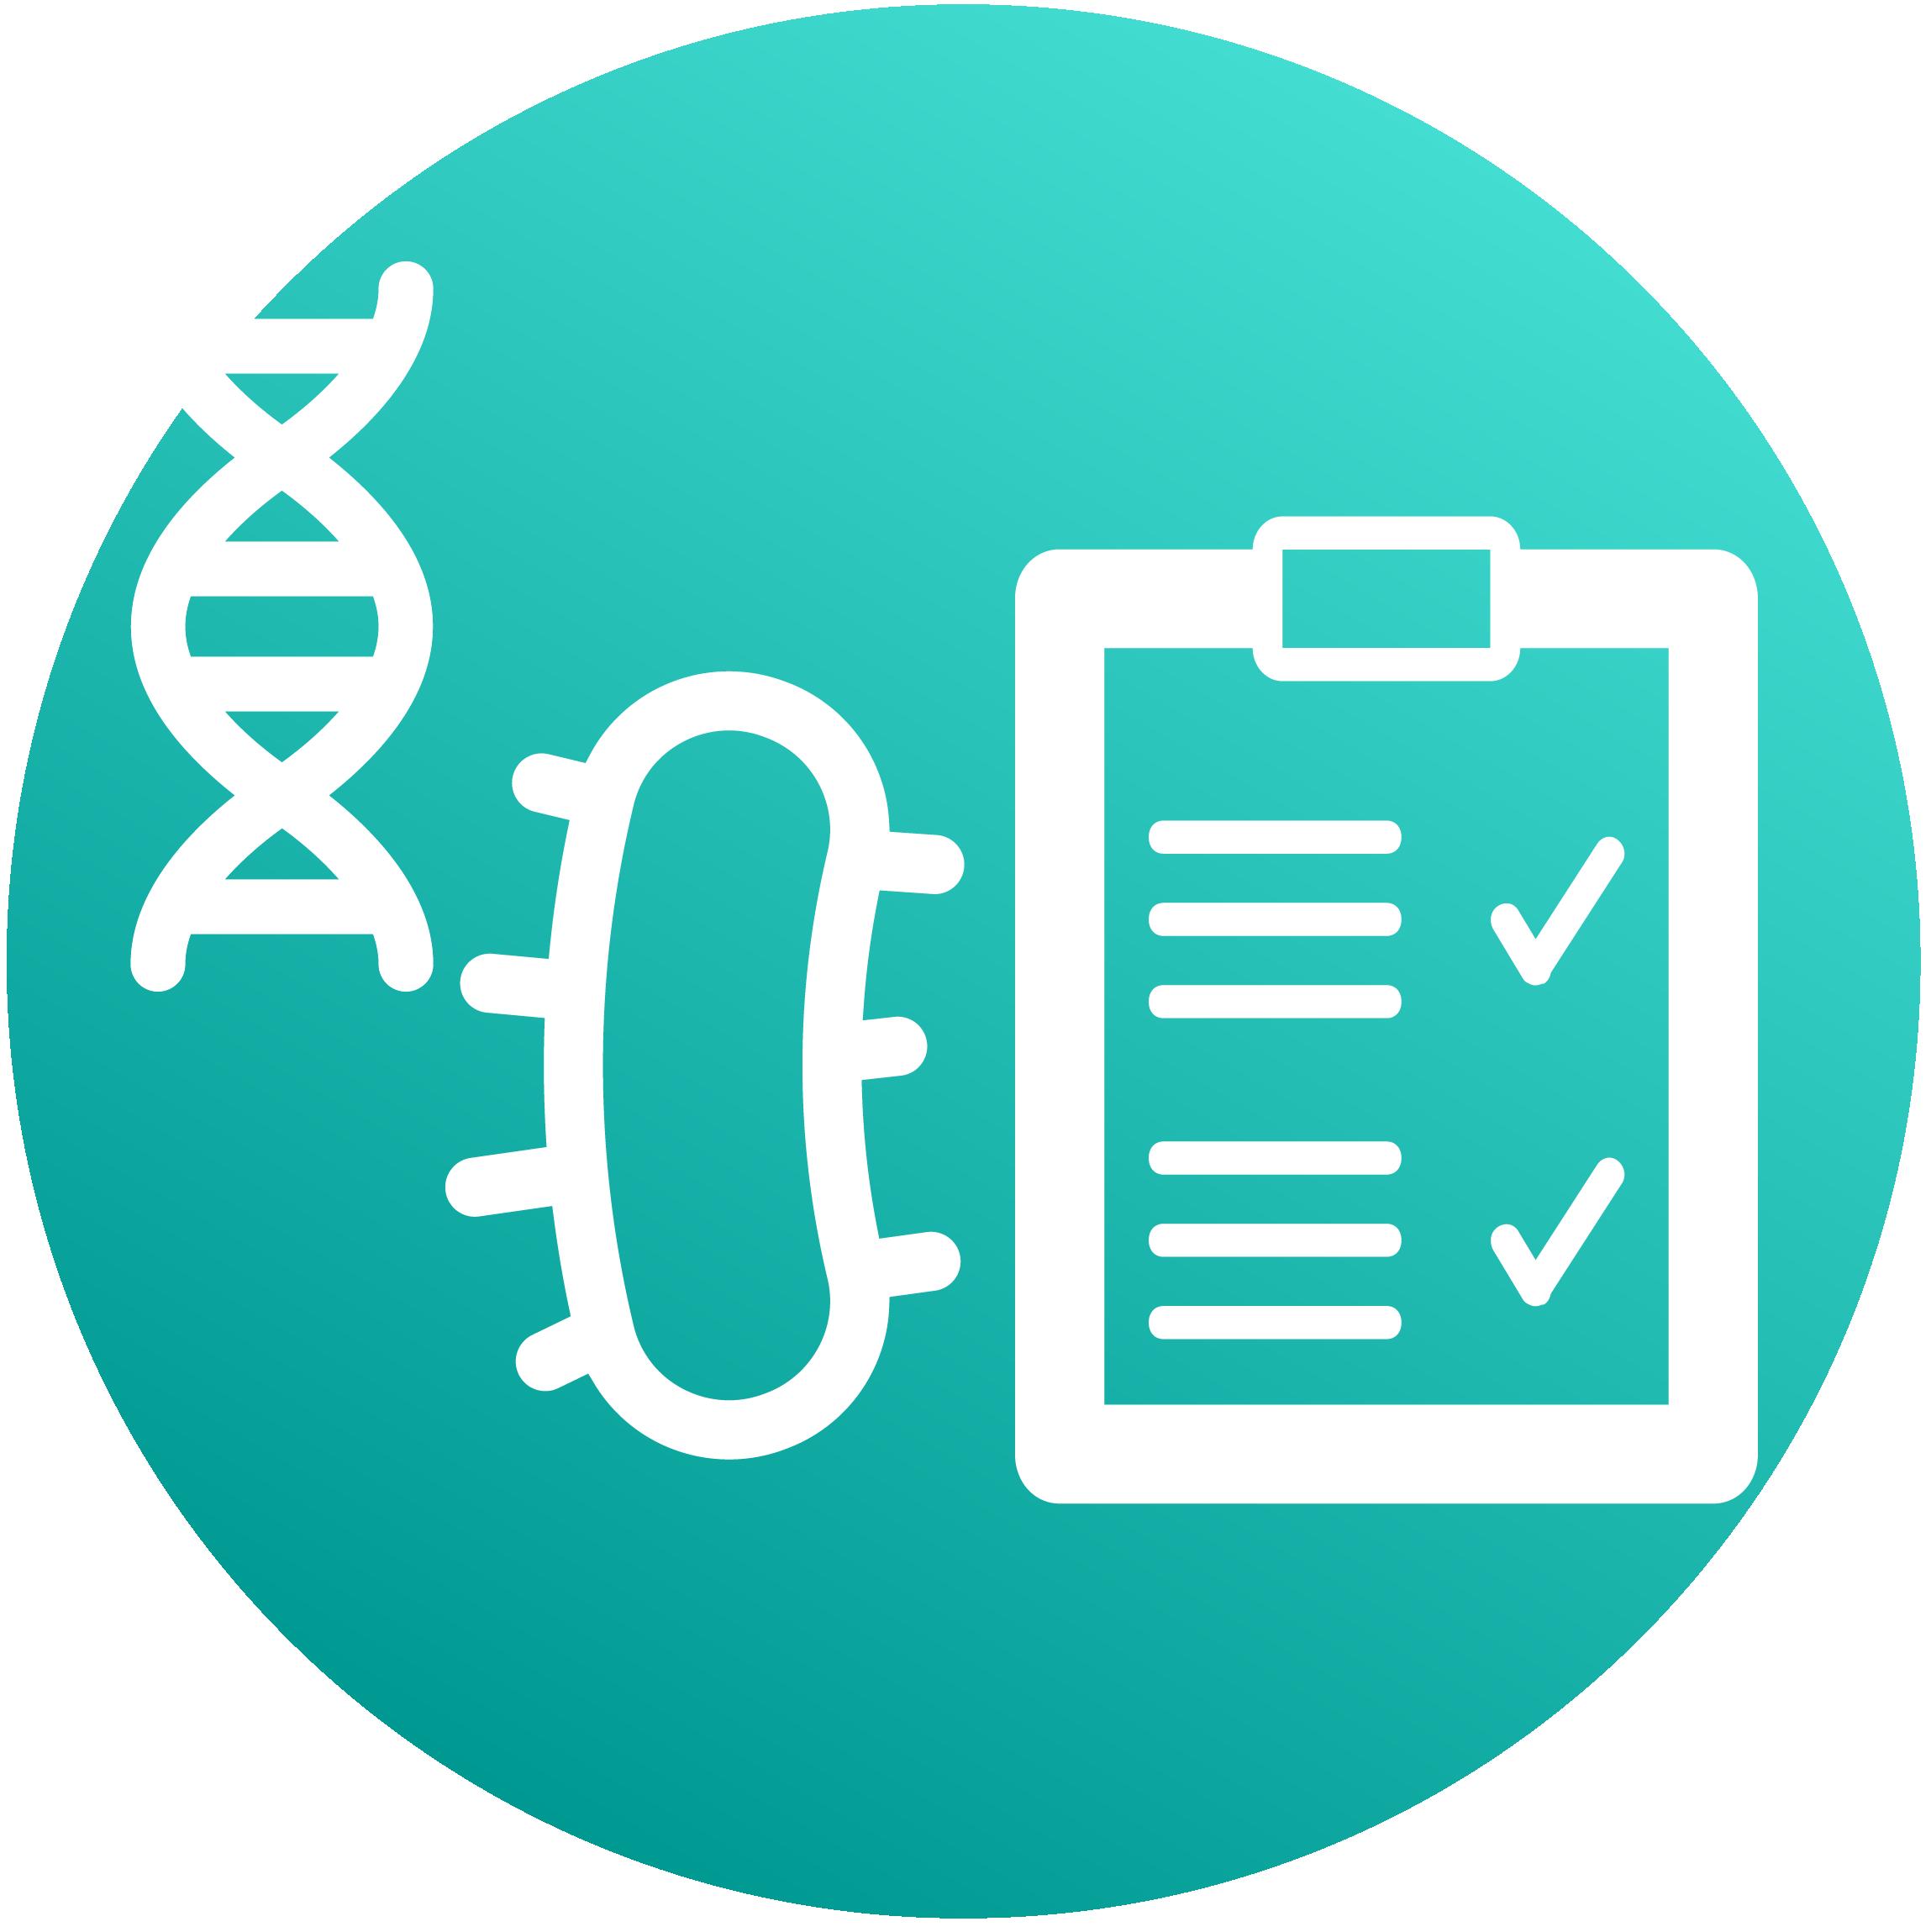 Microbiology diagnostics picto